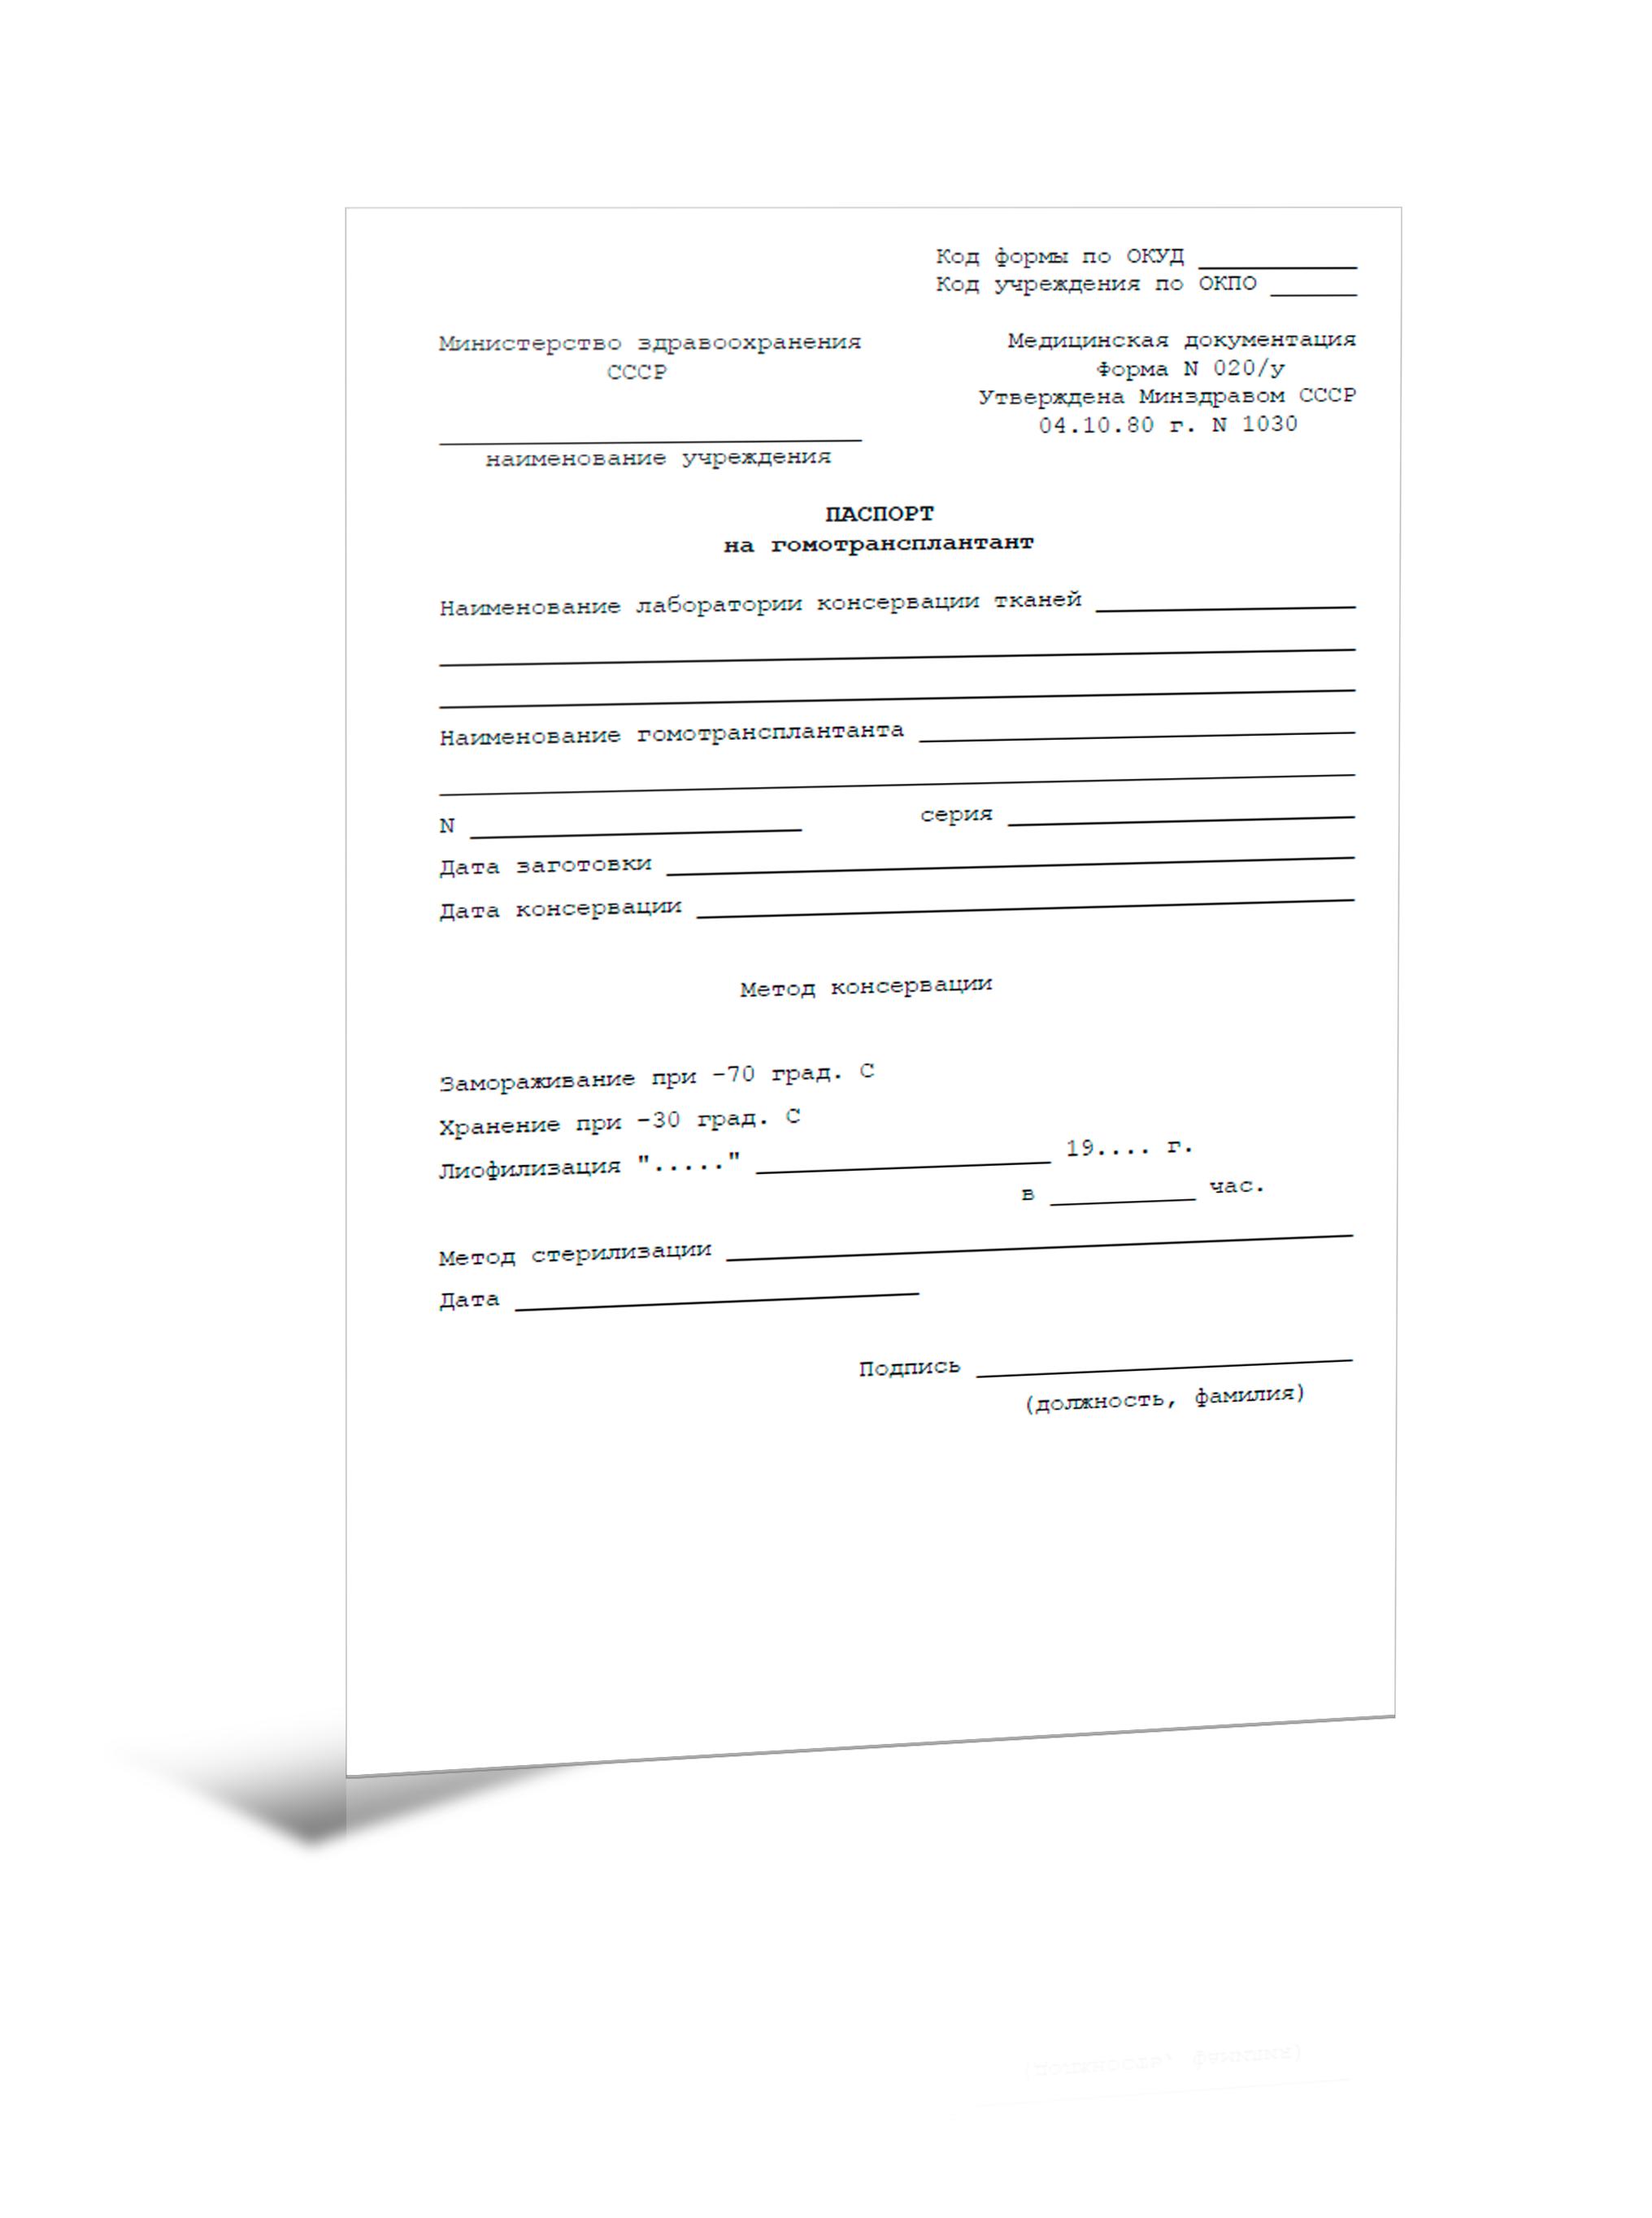 Паспорт на гомотрансплантант (Форма 020/у)